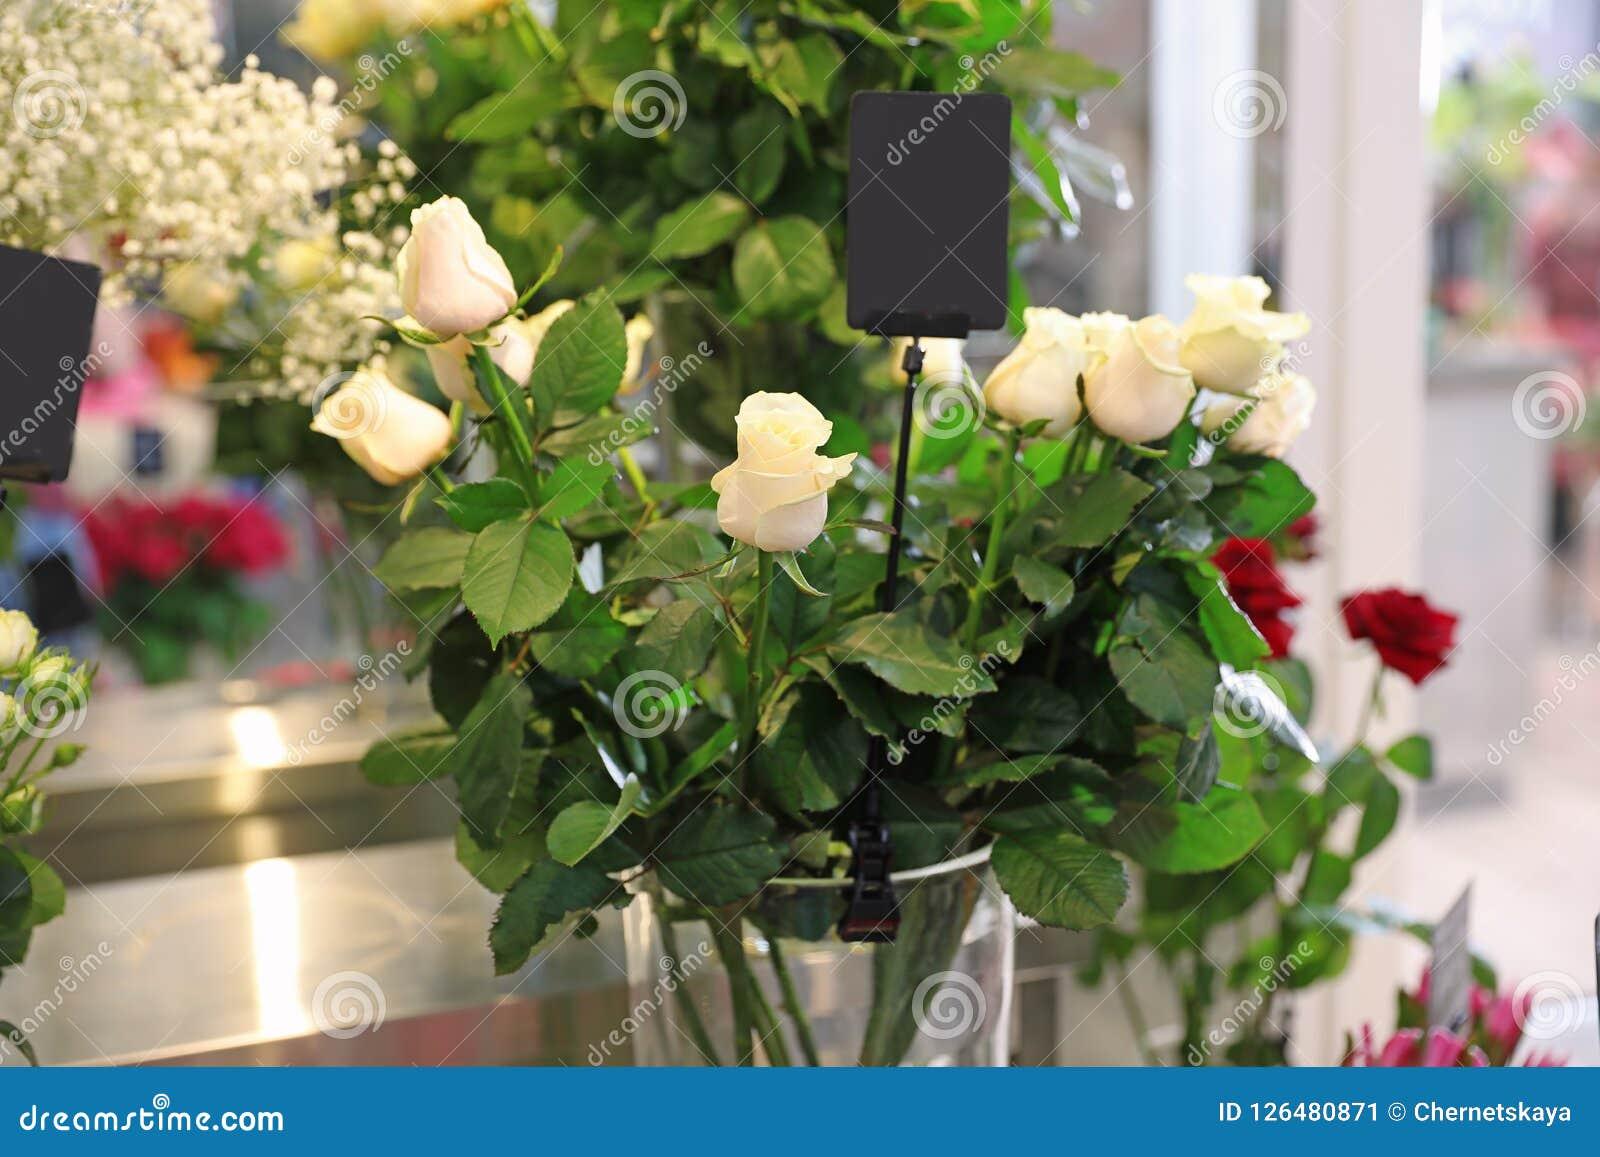 Beautiful fresh flowers in shop stock image image of natural download beautiful fresh flowers in shop stock image image of natural fresh izmirmasajfo